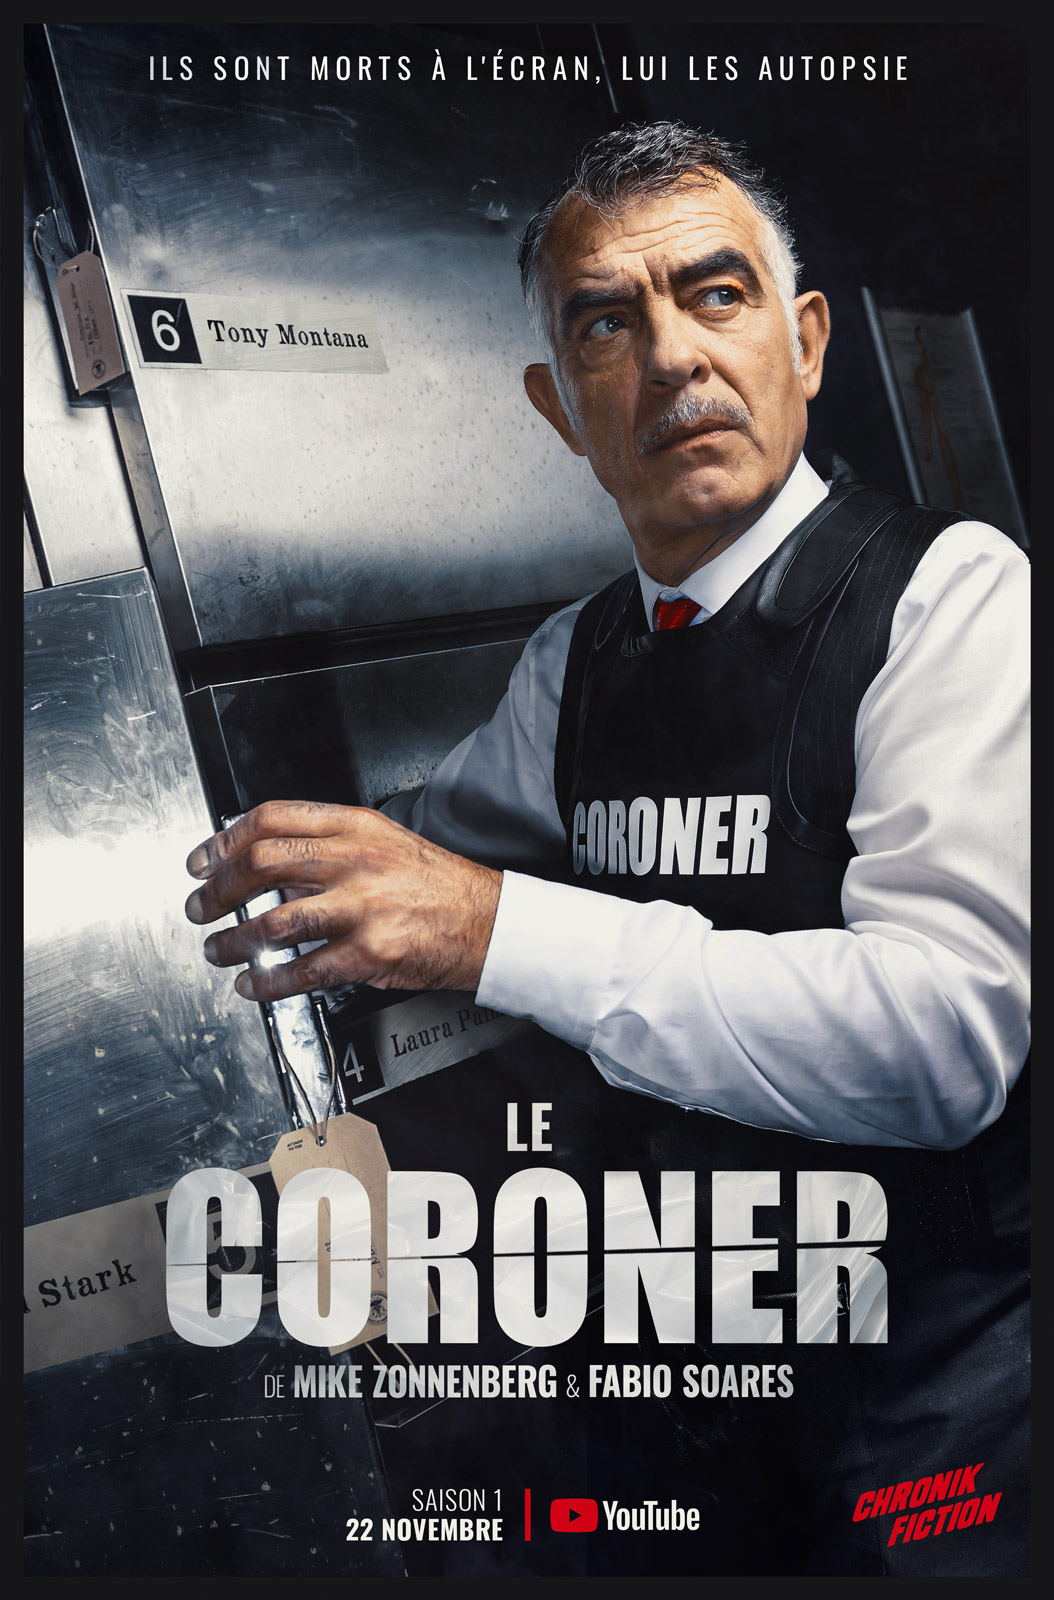 Le Coroner - season 1 - poster designed by Fabio Soares